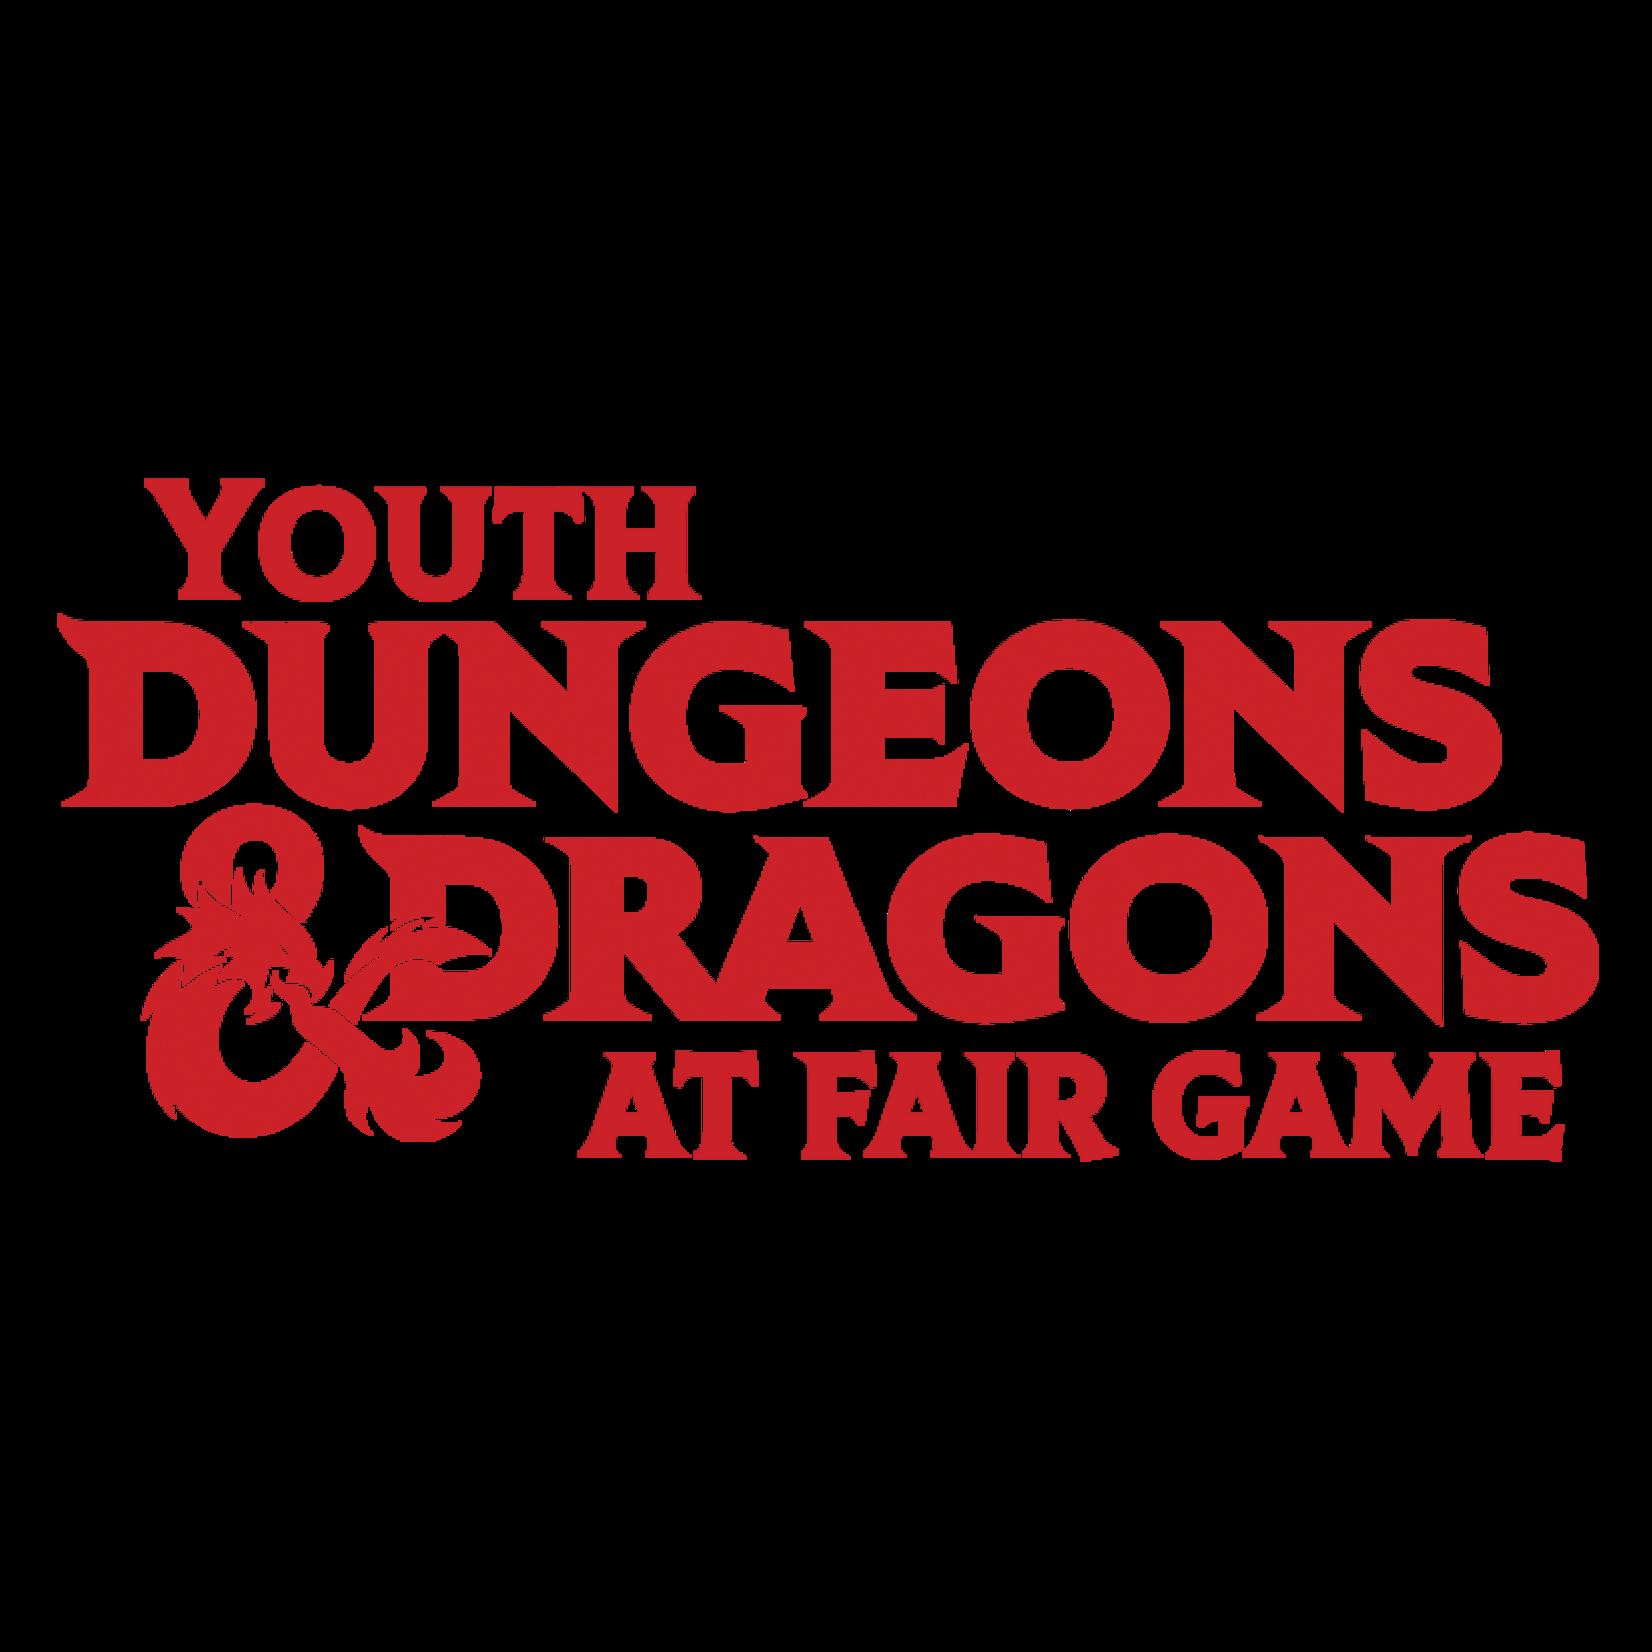 Fair Game YDND Summer 2021 - Group V1 - Fri 4-6 PM CST